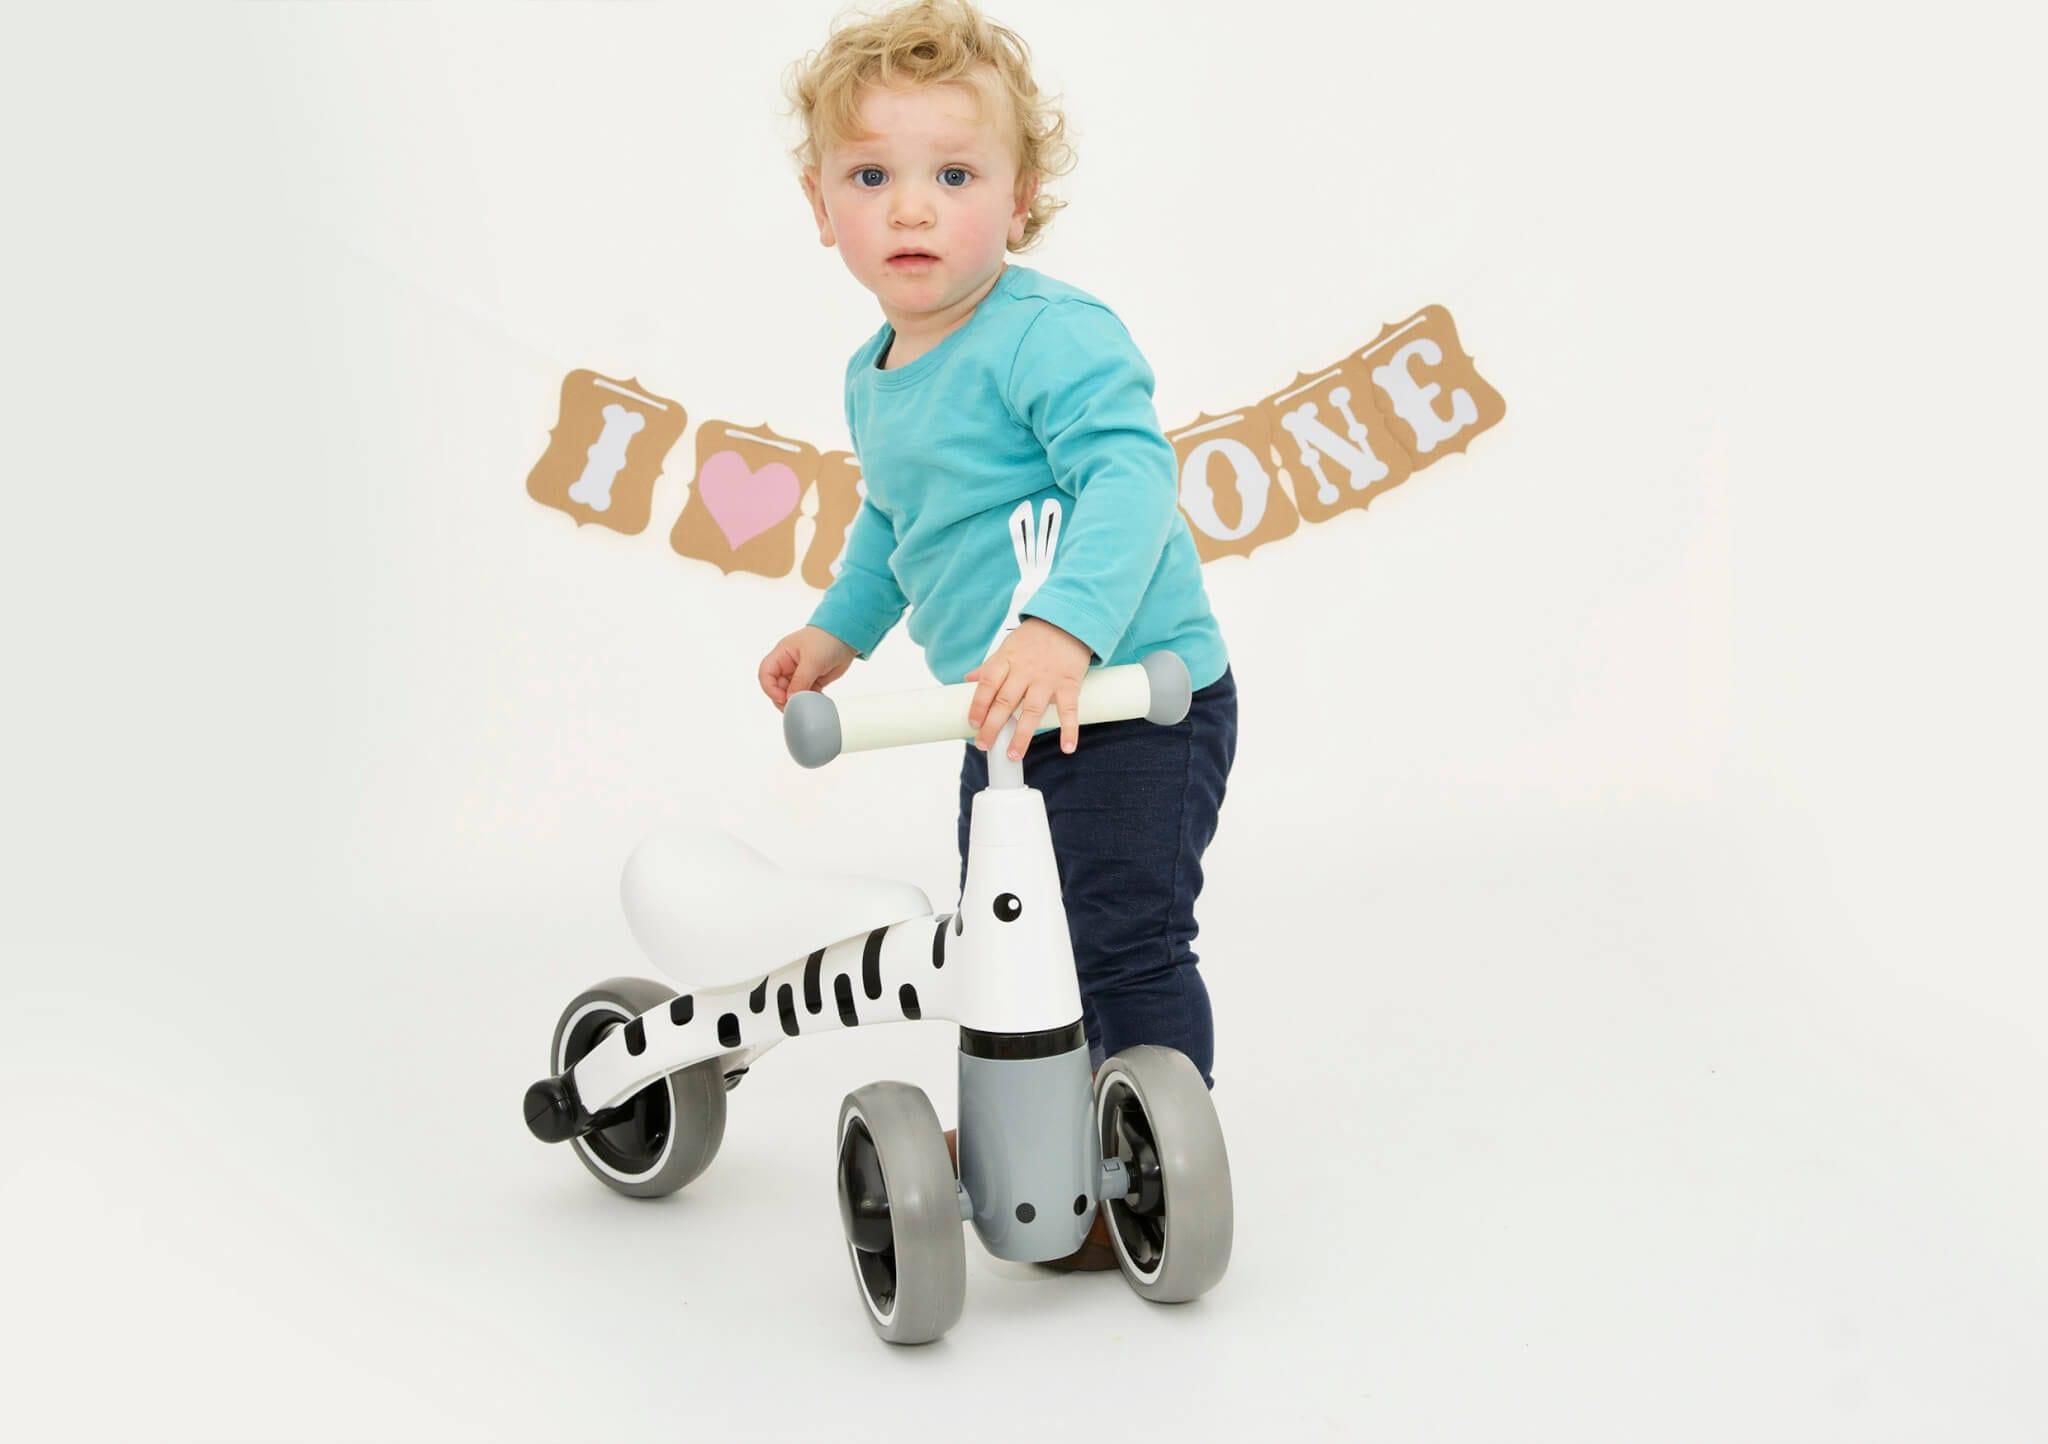 Benefits of a Baby Balance Bike